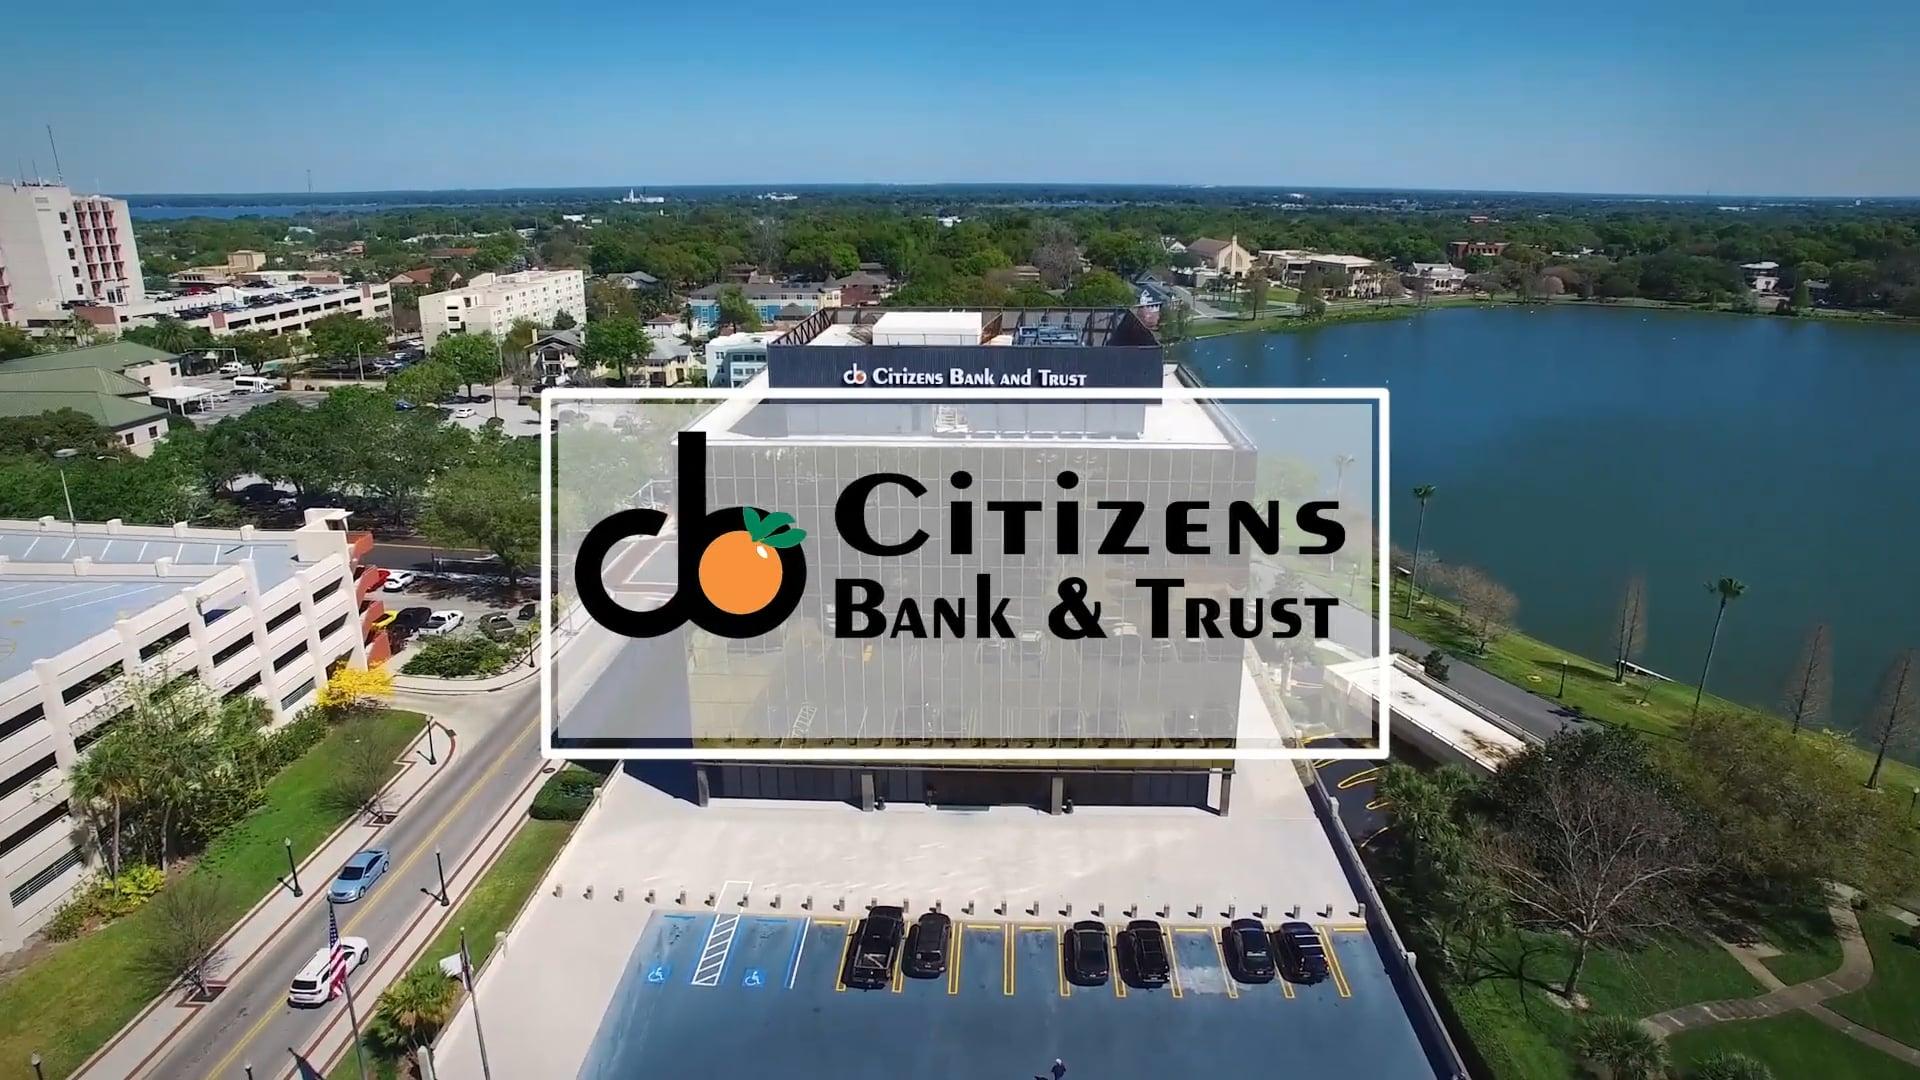 TM - Citizens Bank & Trust